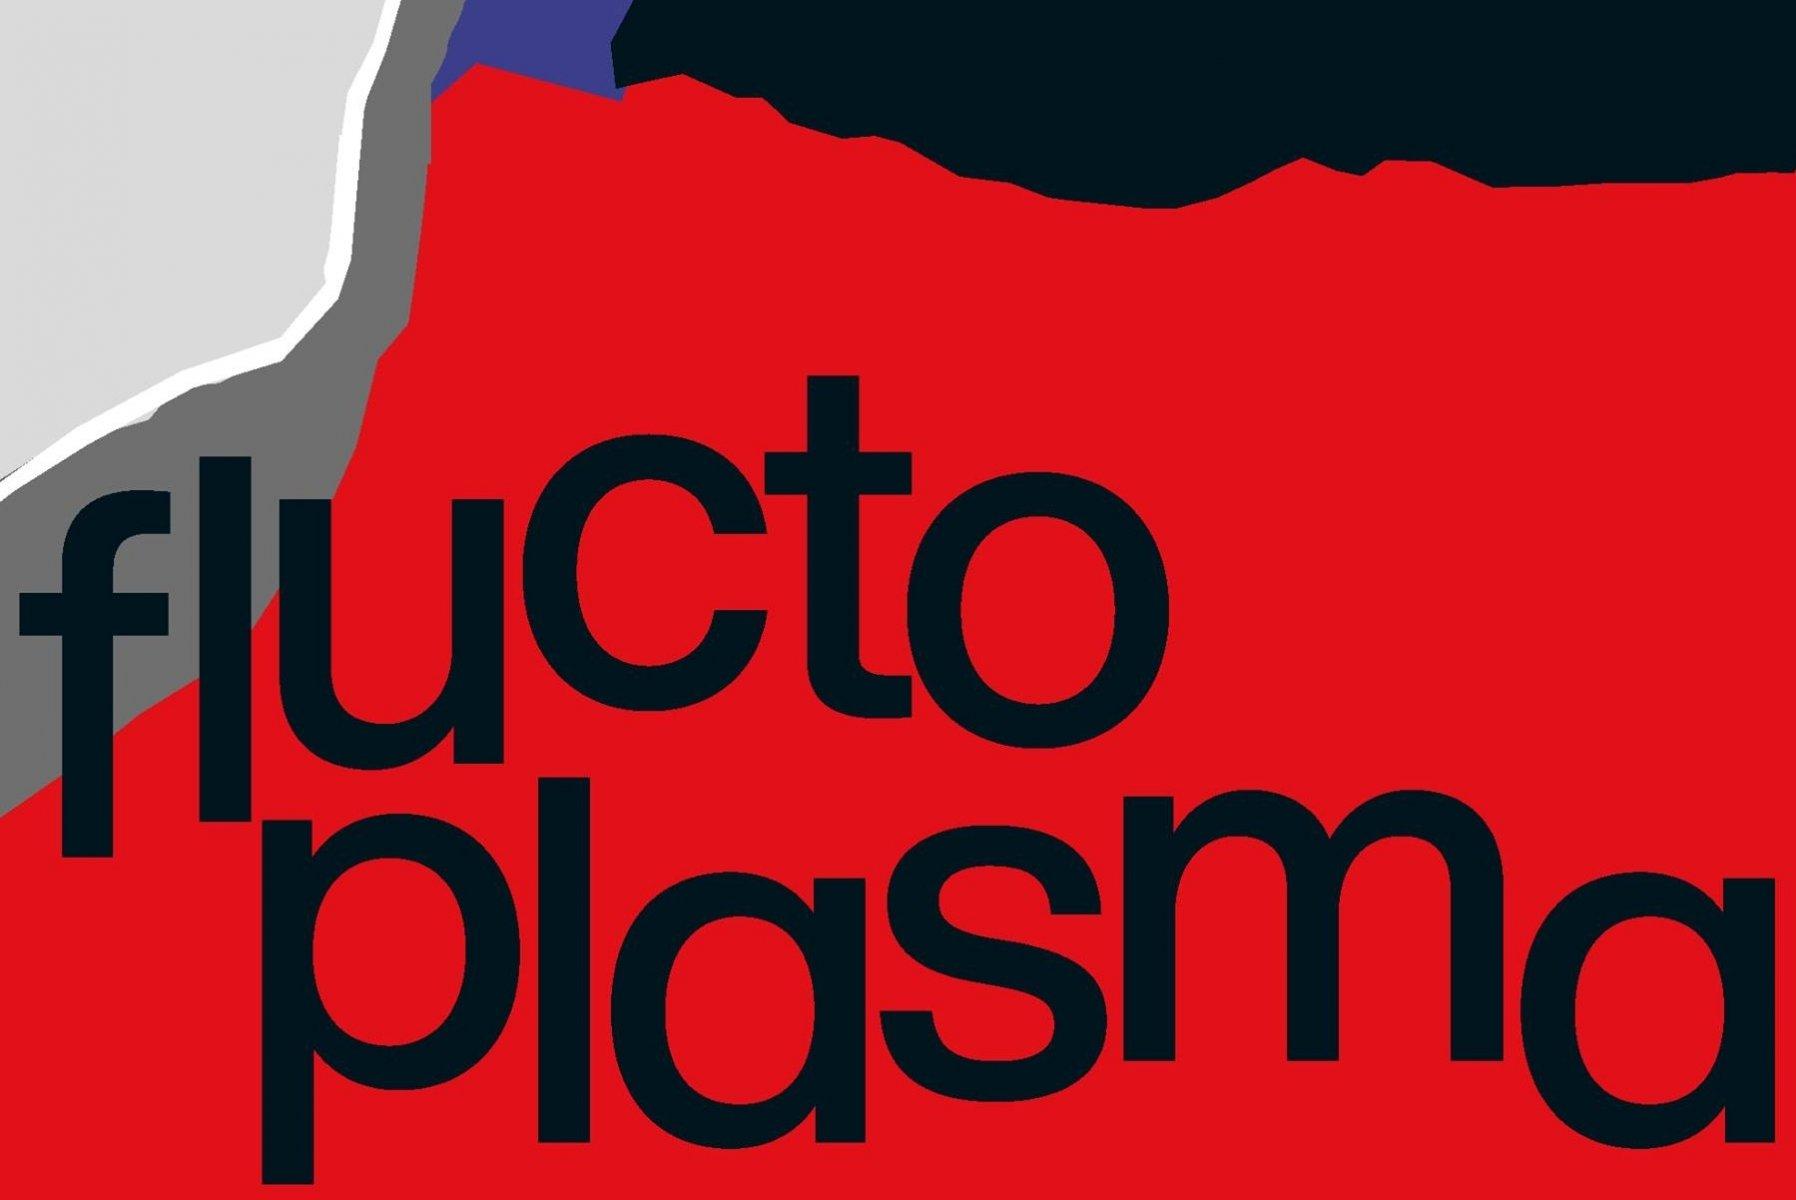 Fluctoplasma Logo – ©Fluctoplasma